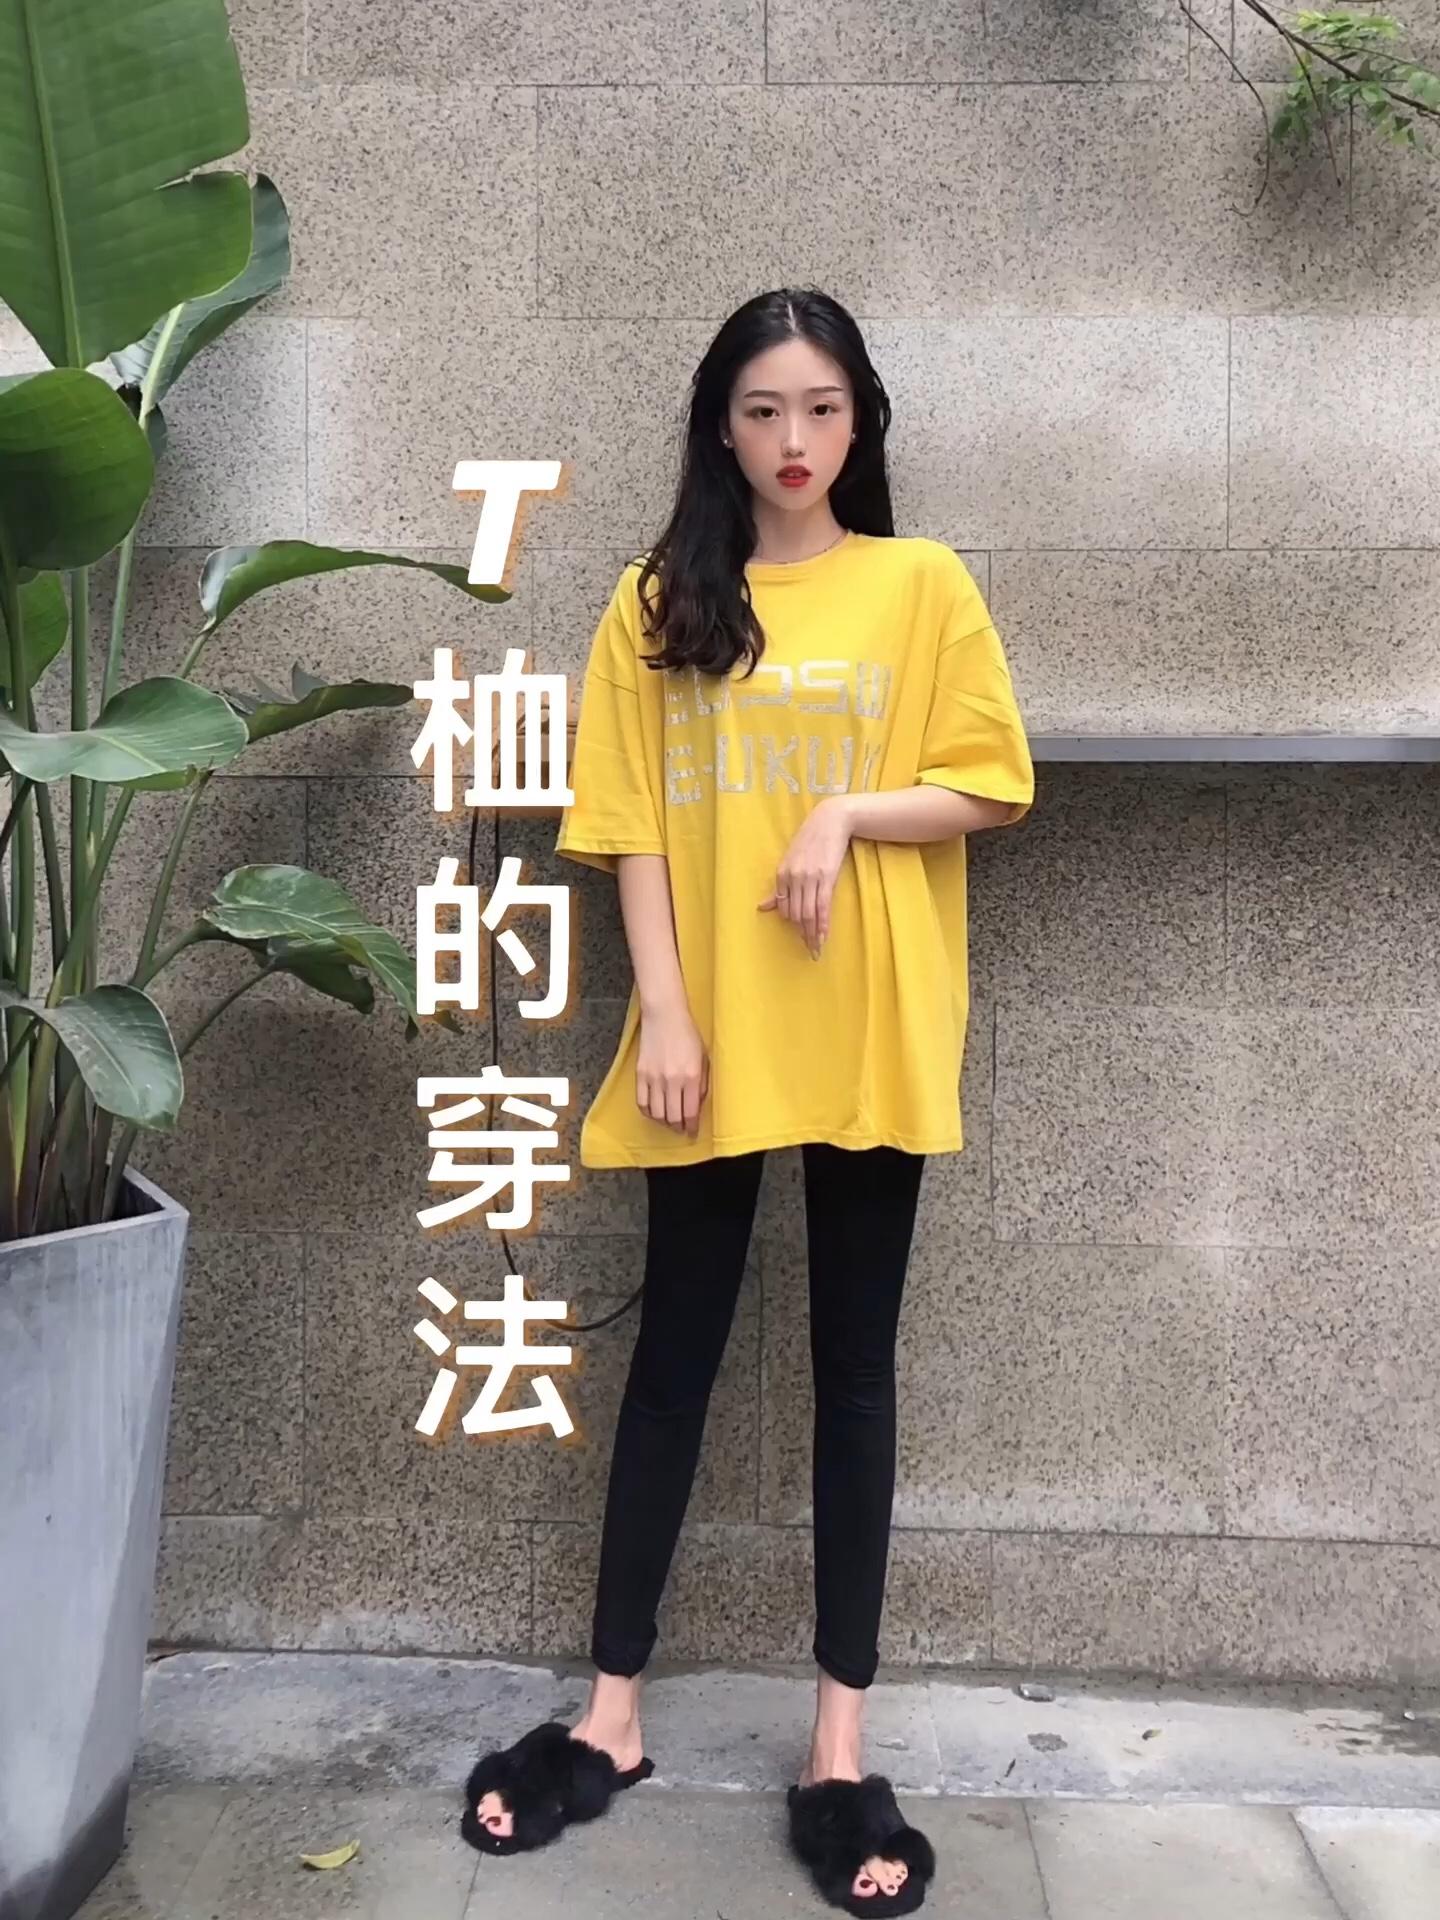 CHIOKi穿搭 T恤的穿法 #小仙女的长腿搭配秘籍#  夏日炎炎就要穿上清凉的衣服呀~ 黄色很吸眼球哦 宽松版型🍋 很好的藏住肉肉~